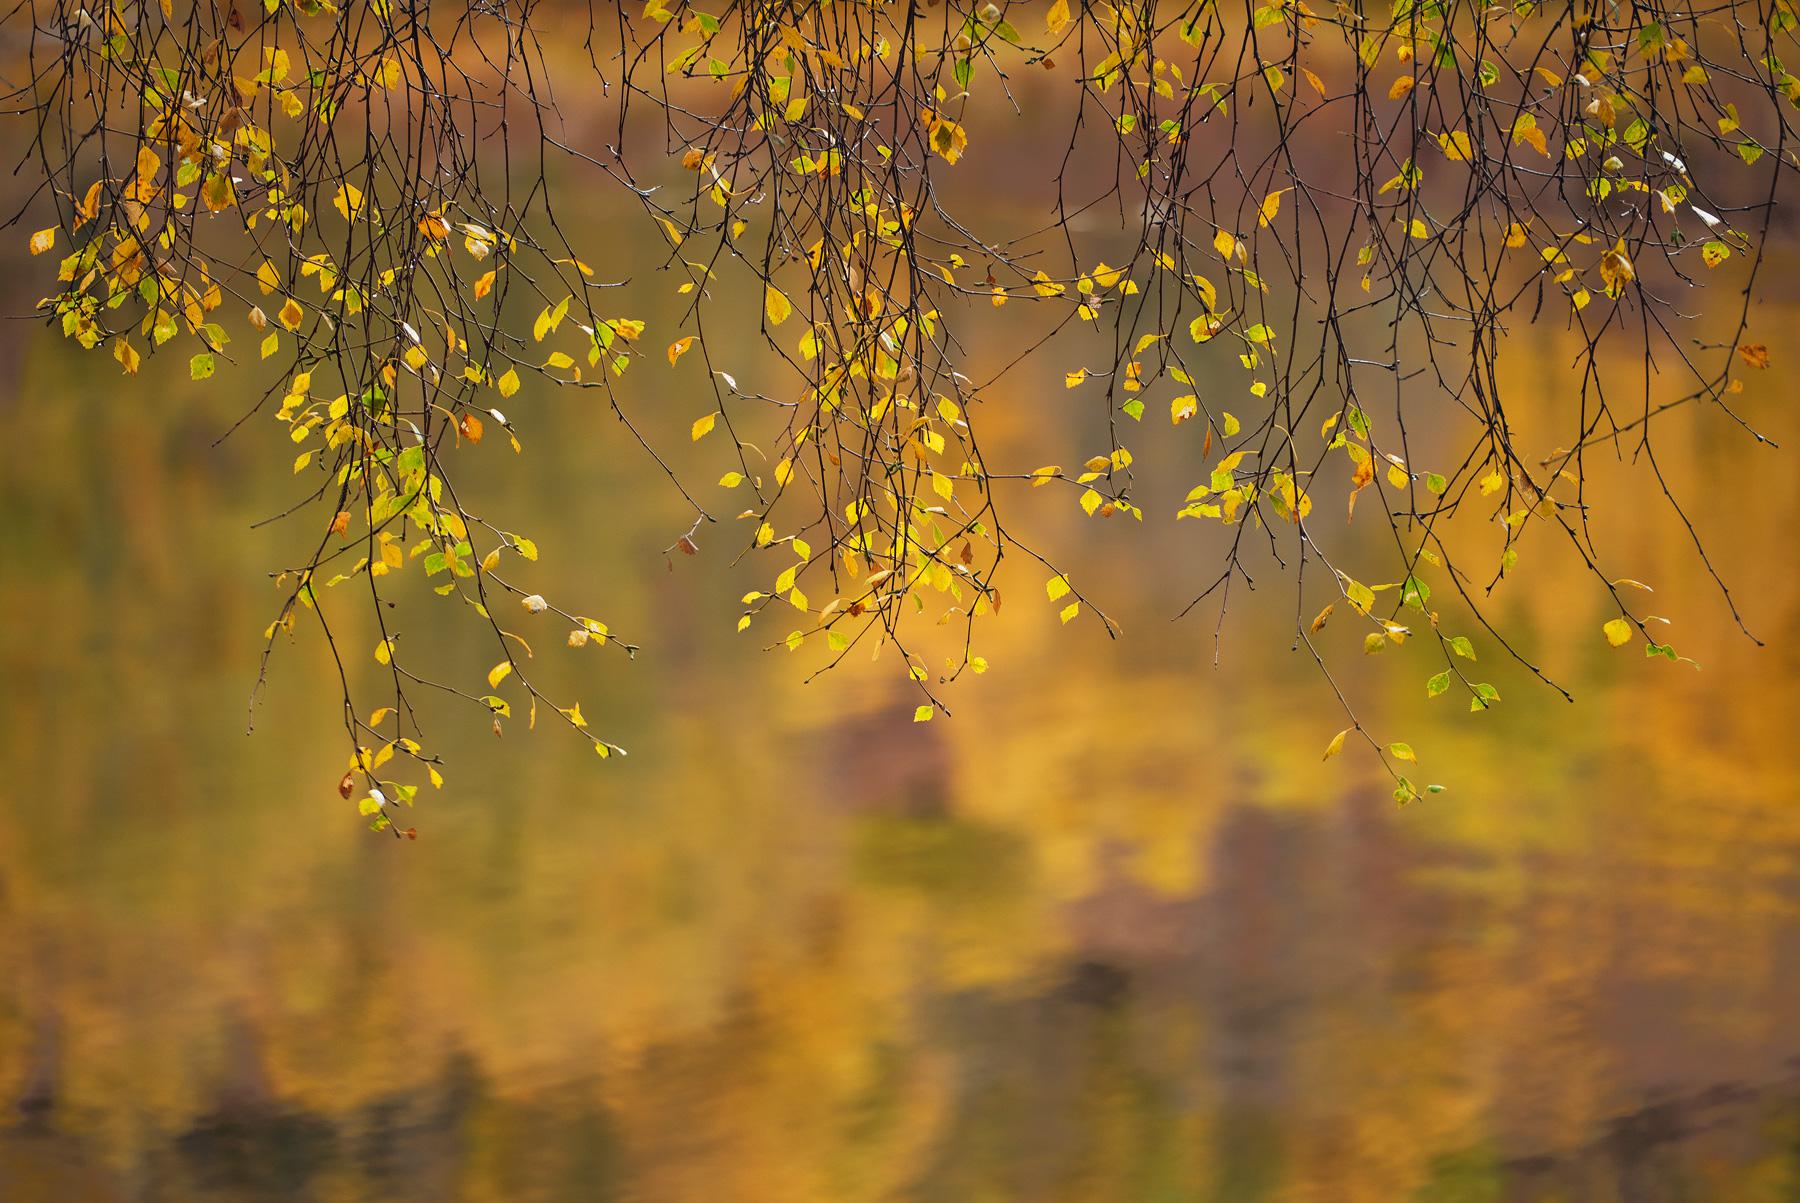 Birch Blinds, Glen Cannich, Highlands, Scotland, glen, river, delicate, birch, twigs, placid, still, suspended, reflecti, photo